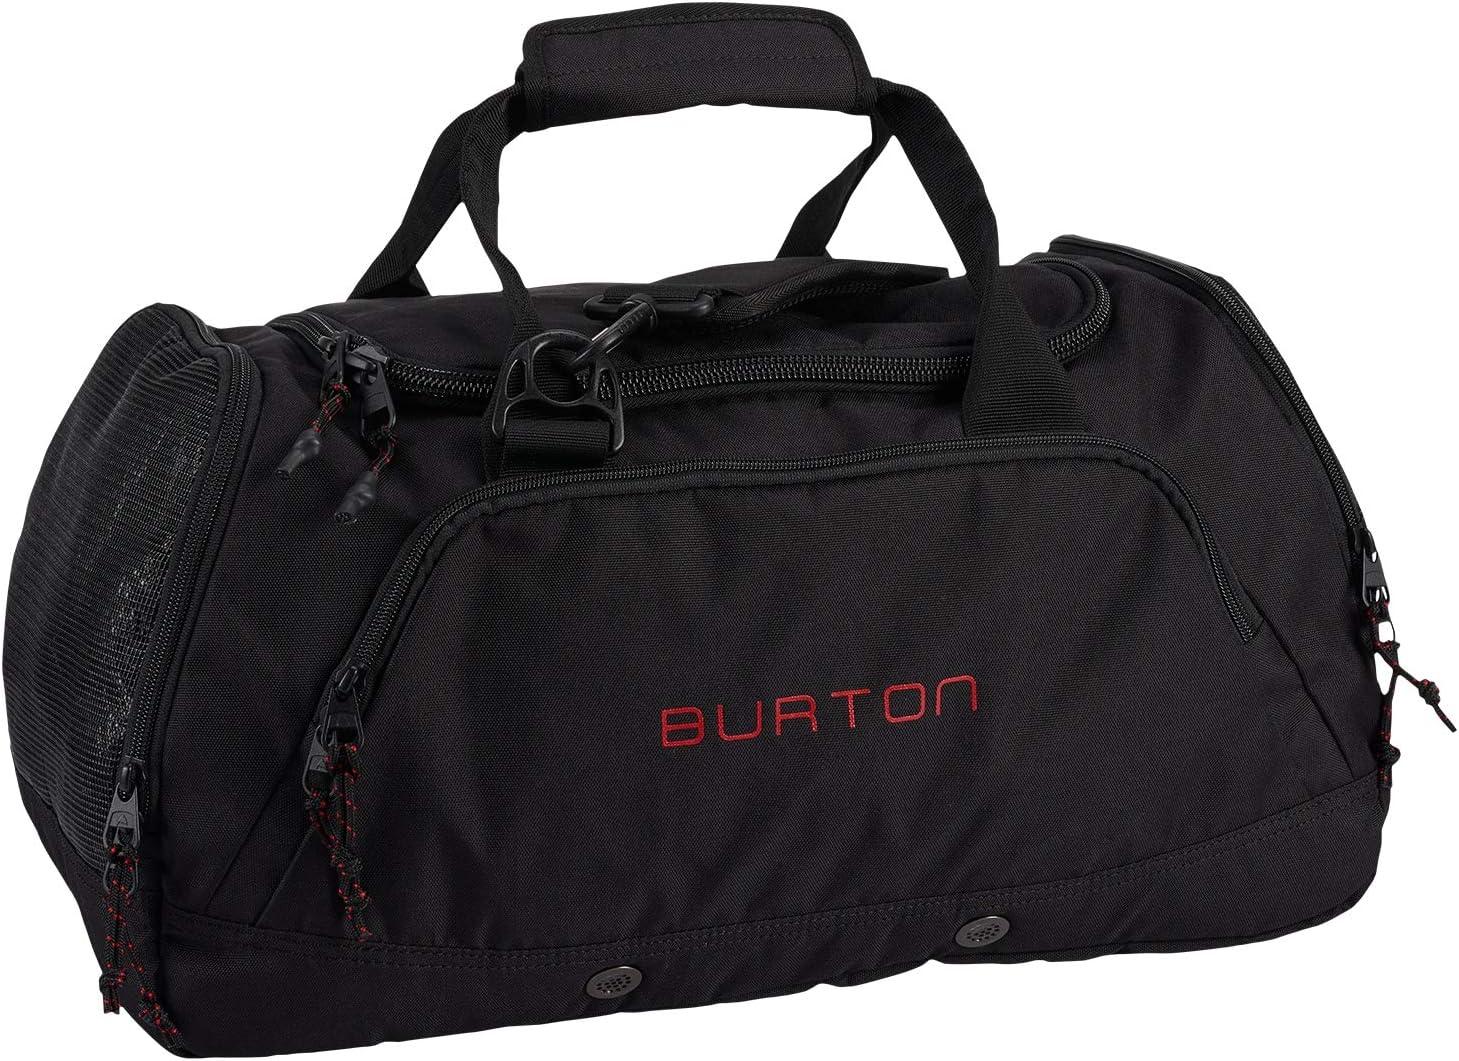 Burton Boothaus Gear Bag 2.0 Medium 81vtbBH4LNL